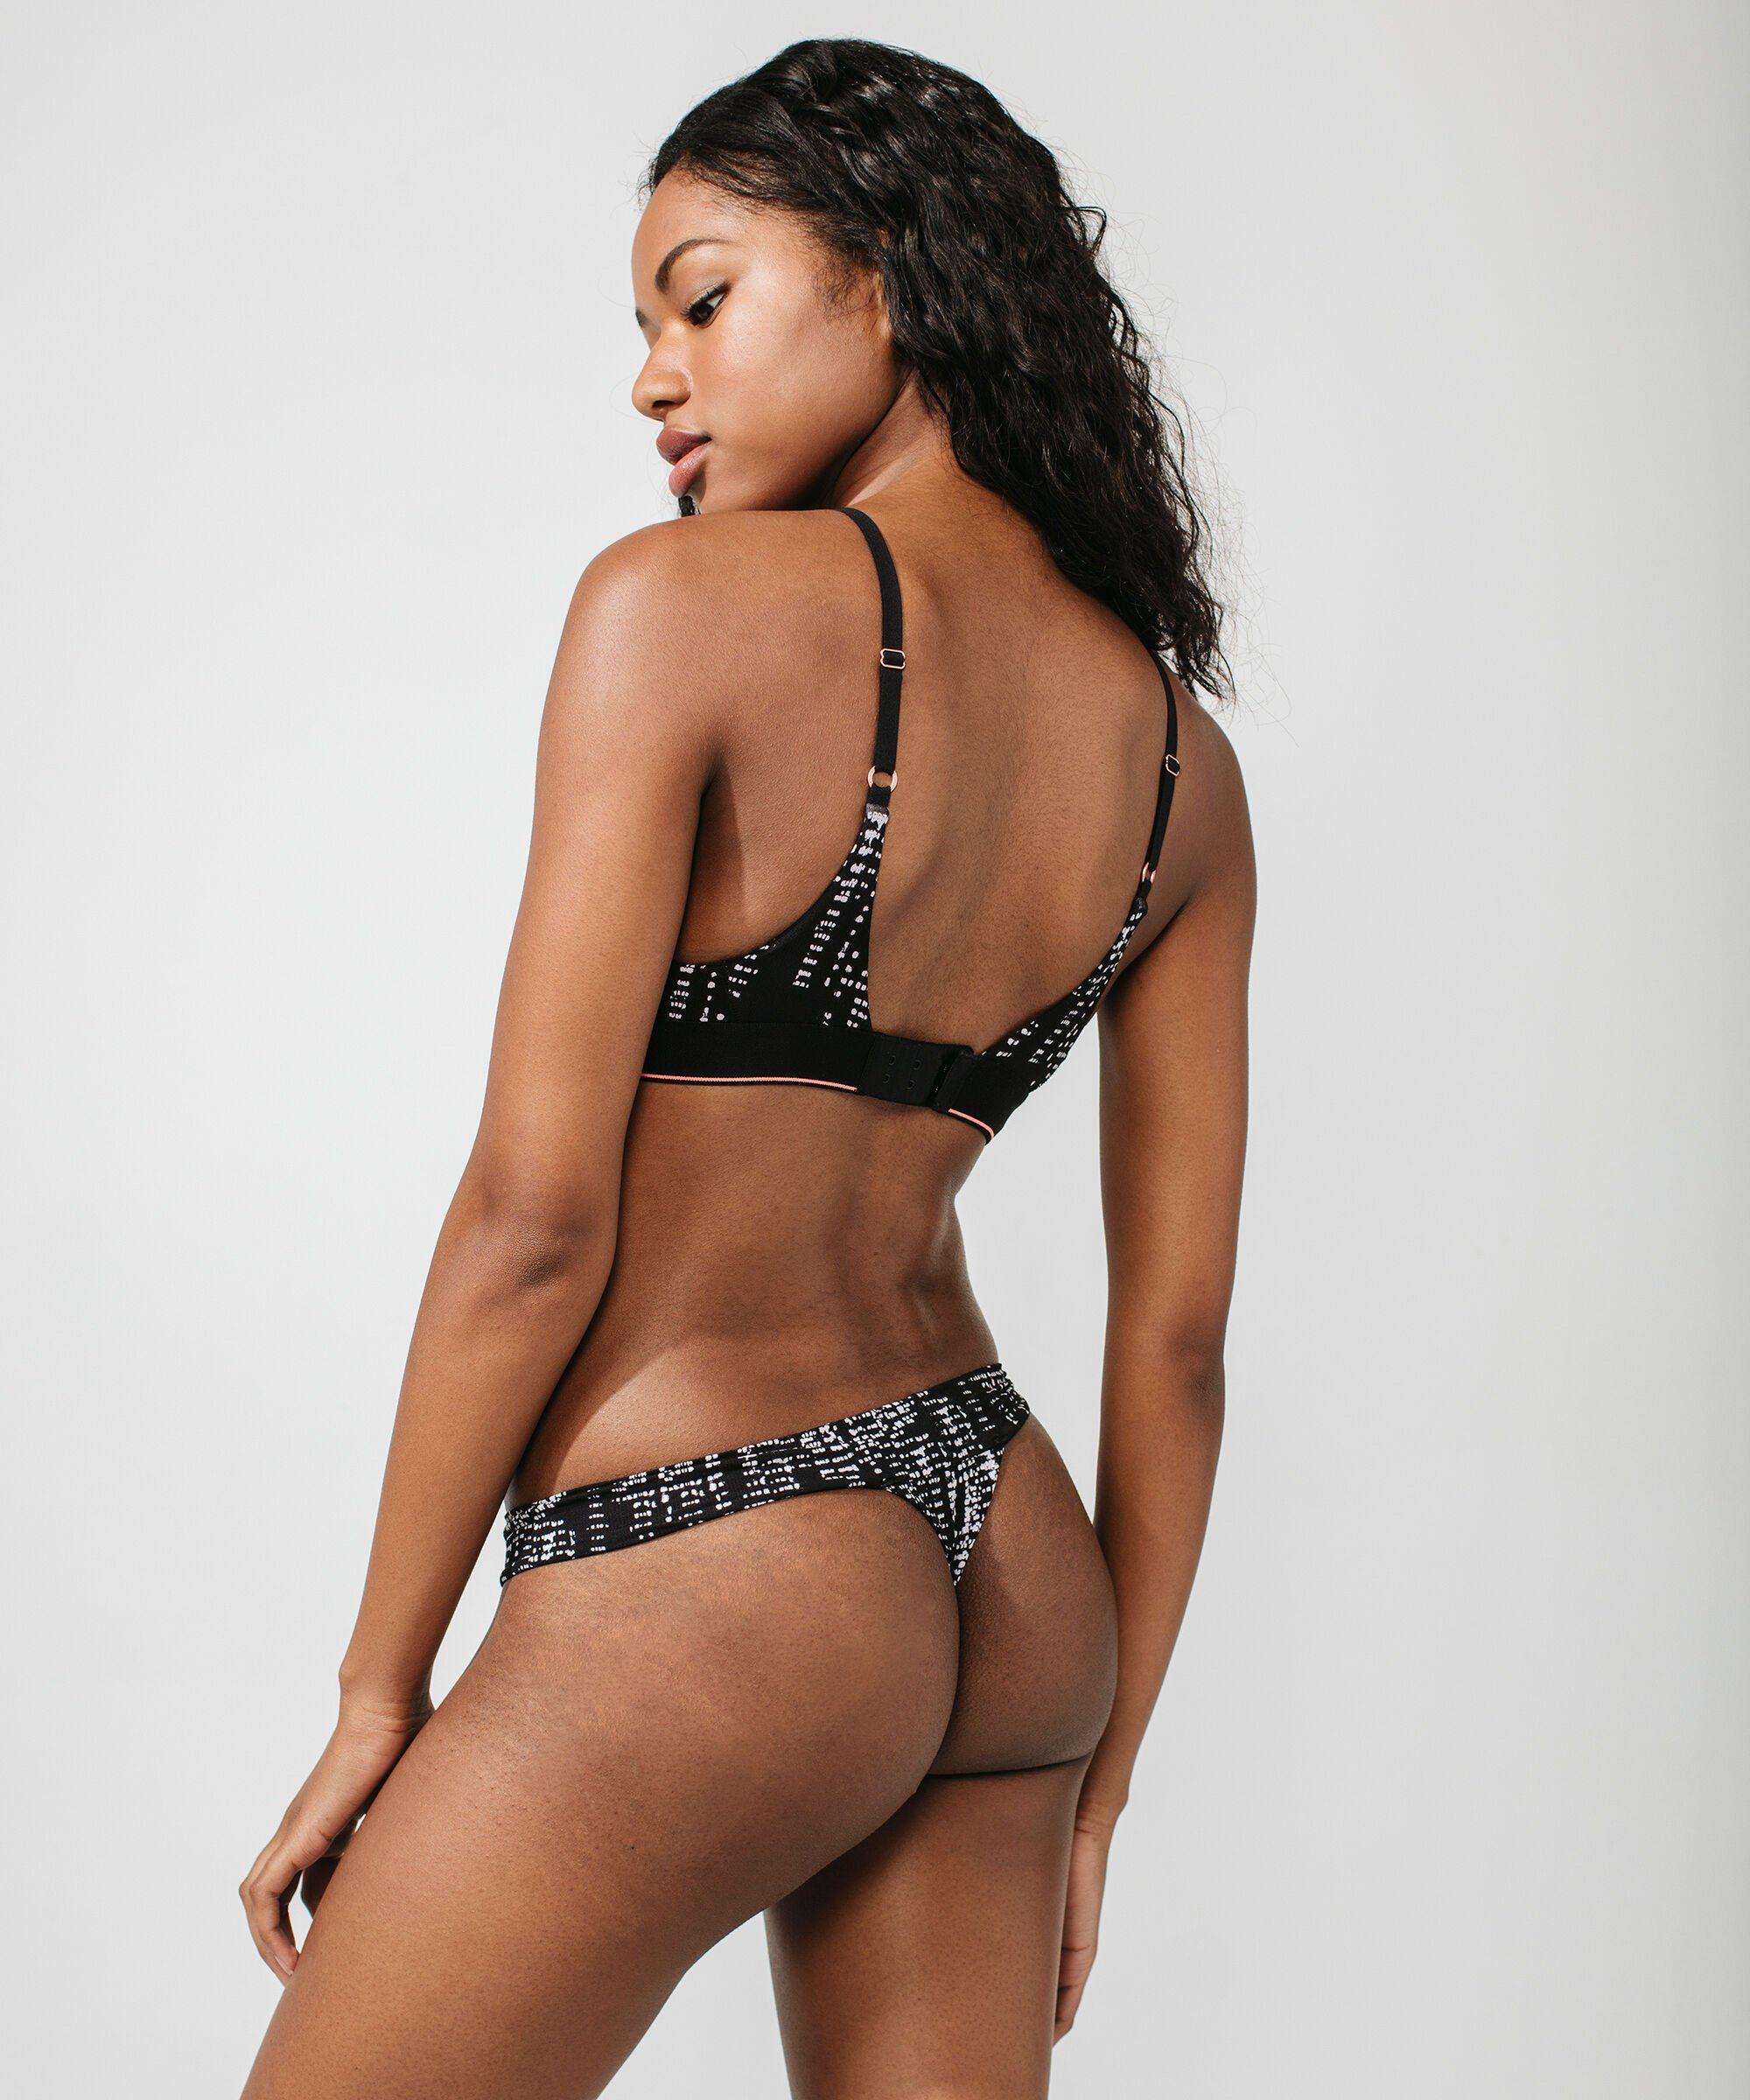 best of Women underwear Voyeur pictures of in